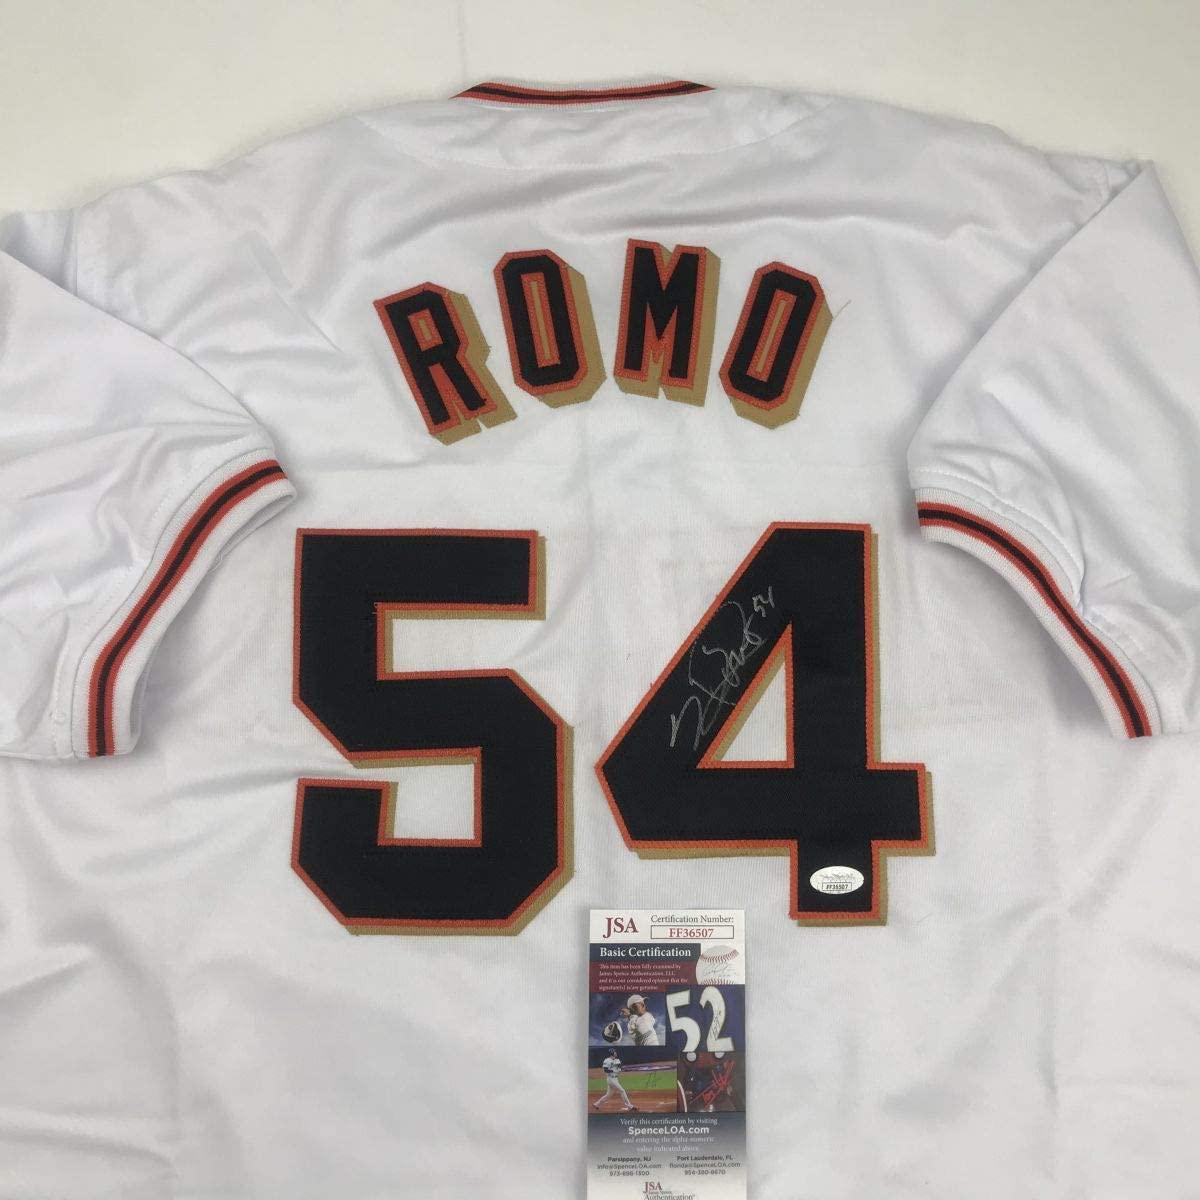 Autographed/Signed Sergio Romo San Francisco White Baseball Jersey JSA COA